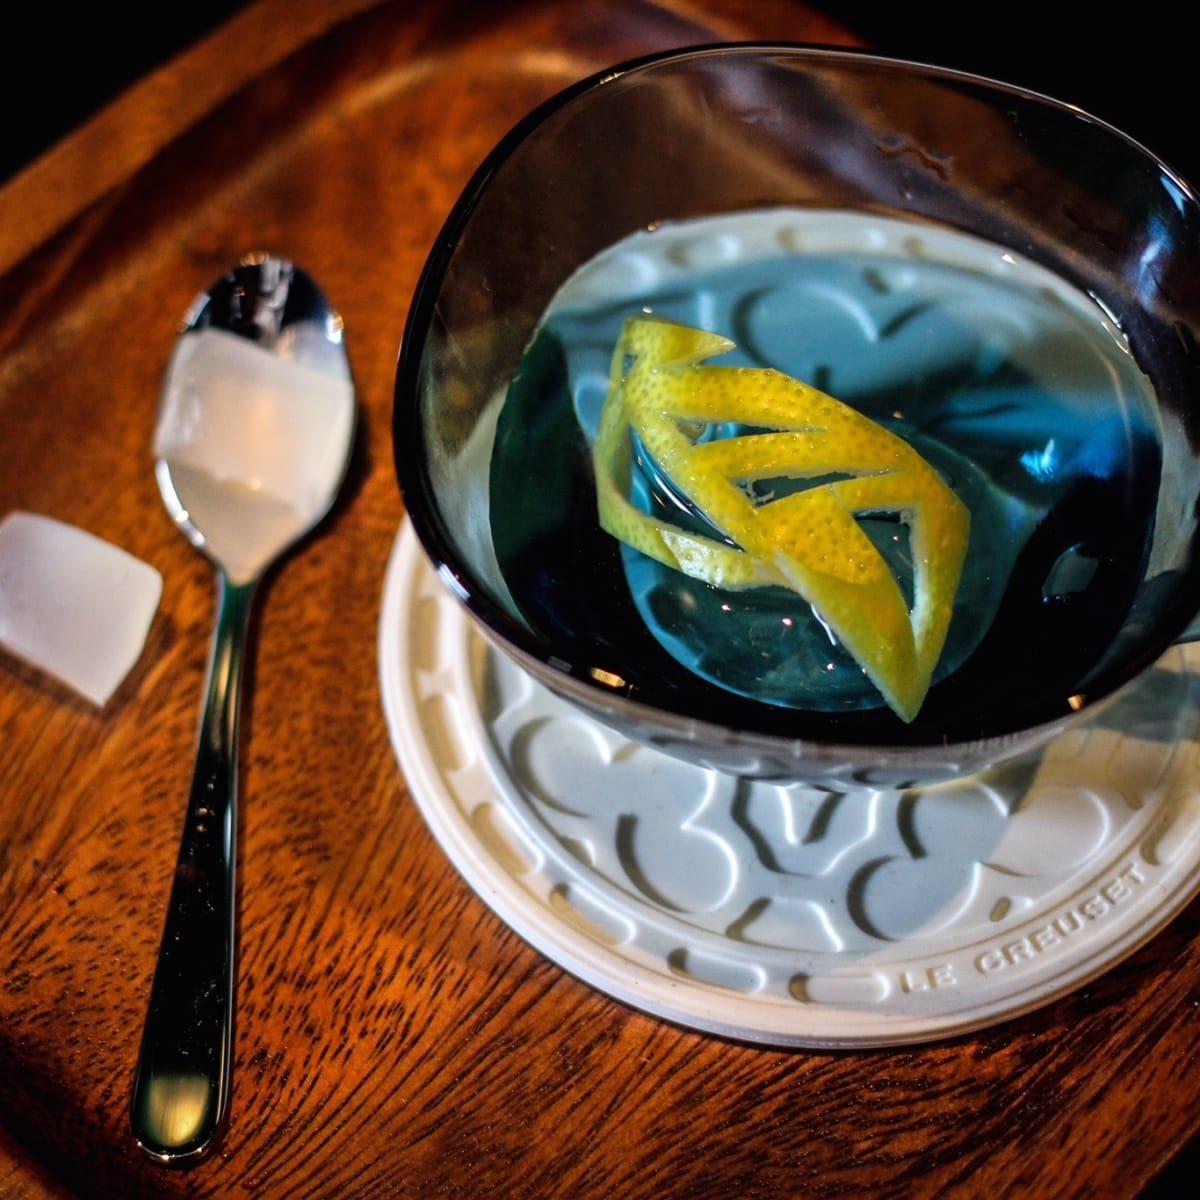 Canard Lyan and Unicorn cocktail